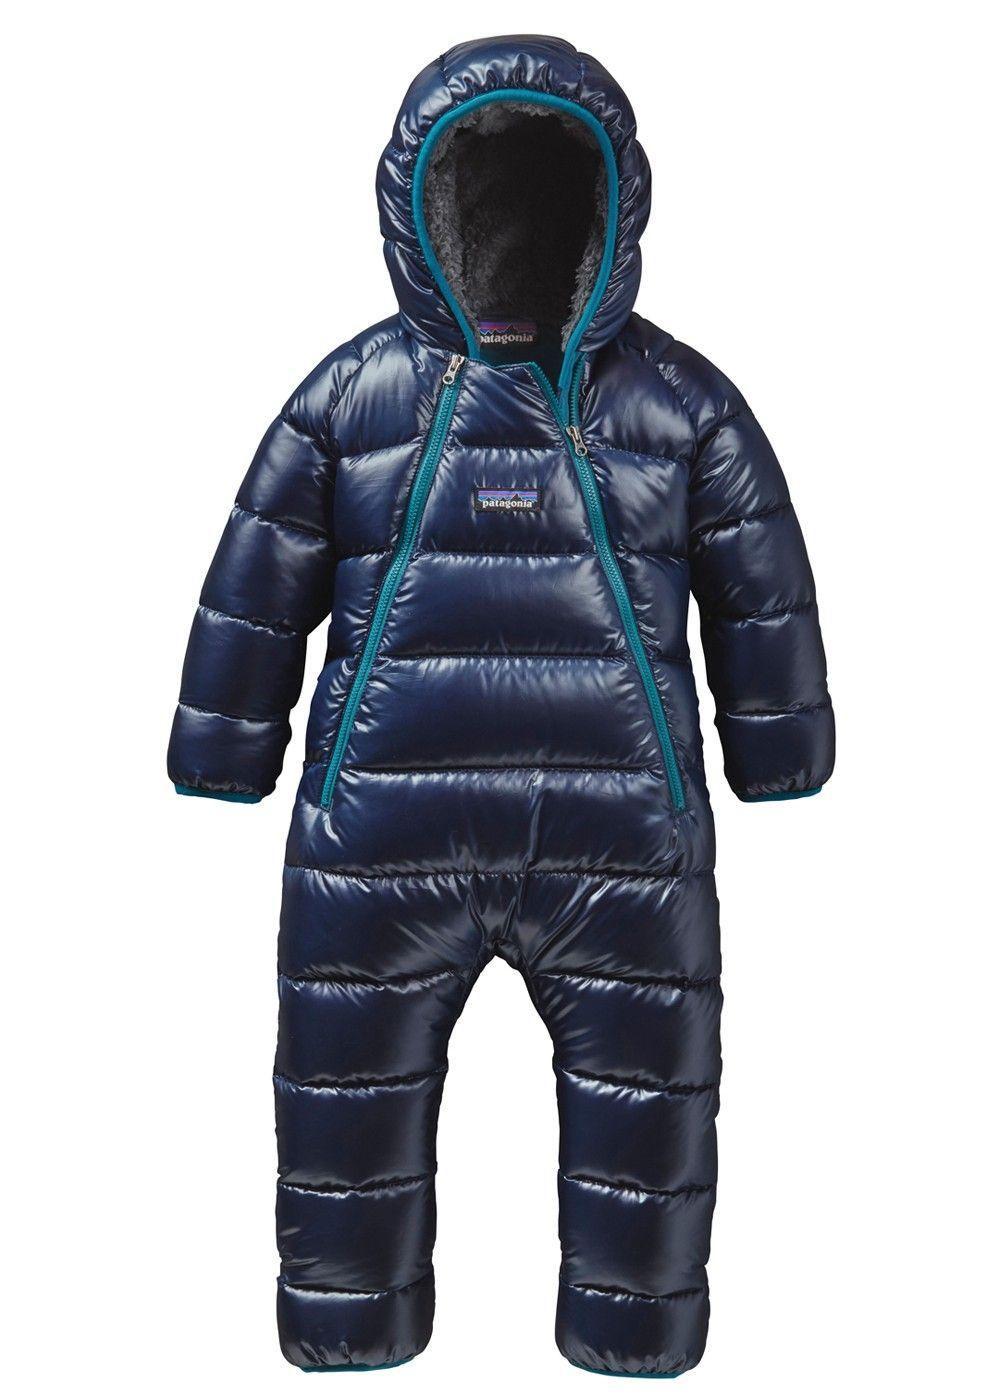 6ddef16e9 Patagonia Baby Hi-Loft Down Sweater Bunting